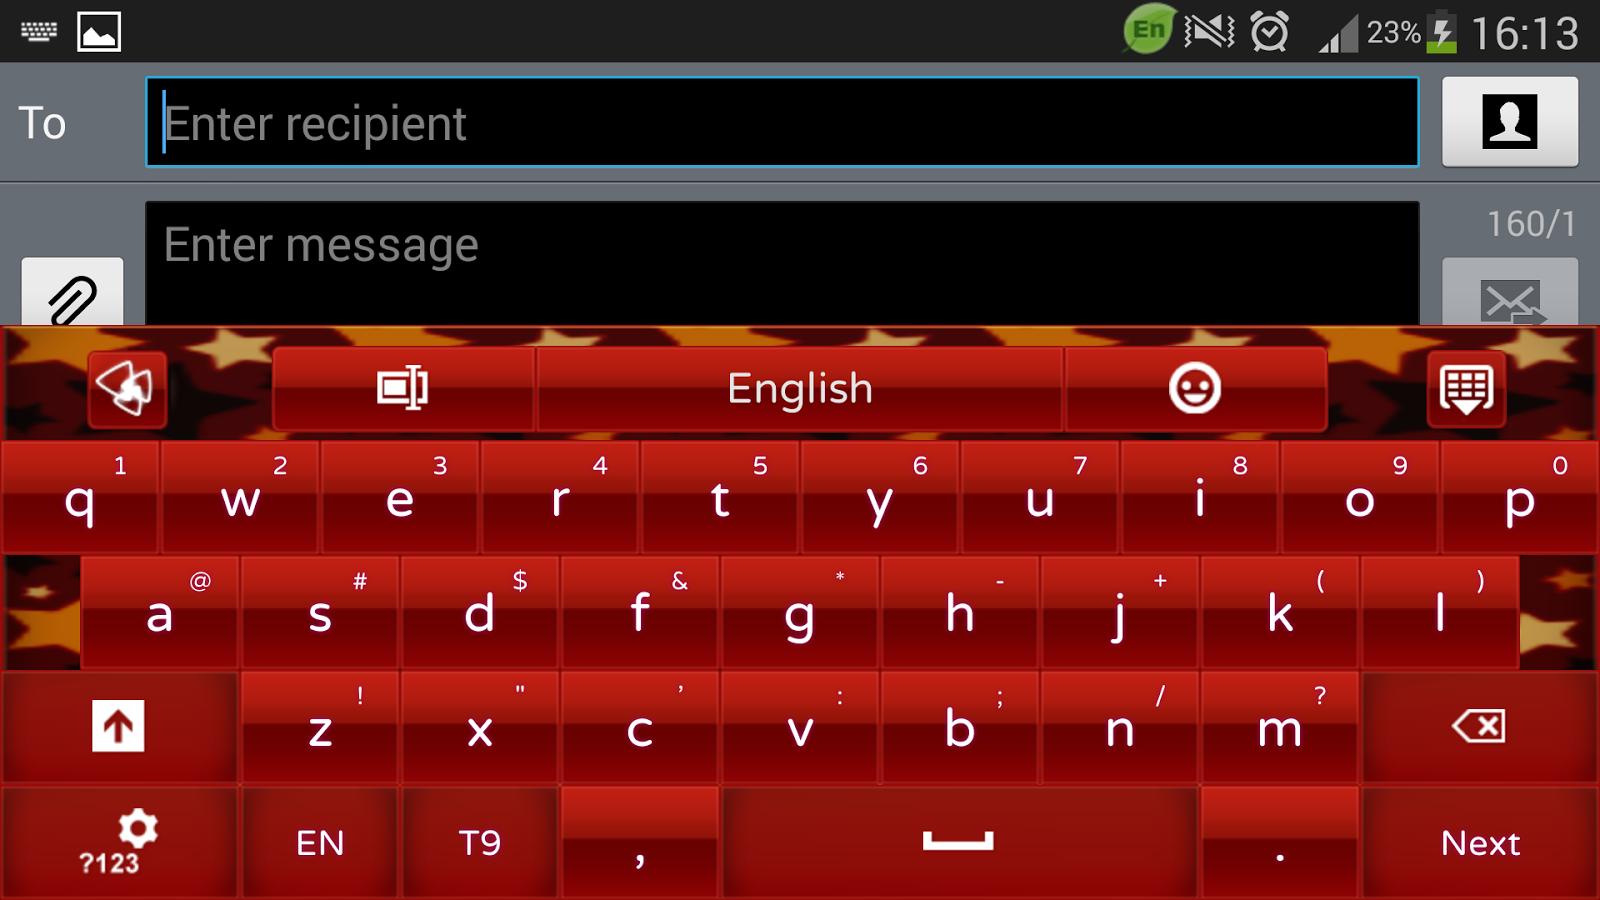 Google themes crvena zvezda - Red Star Keyboard Theme Screenshot